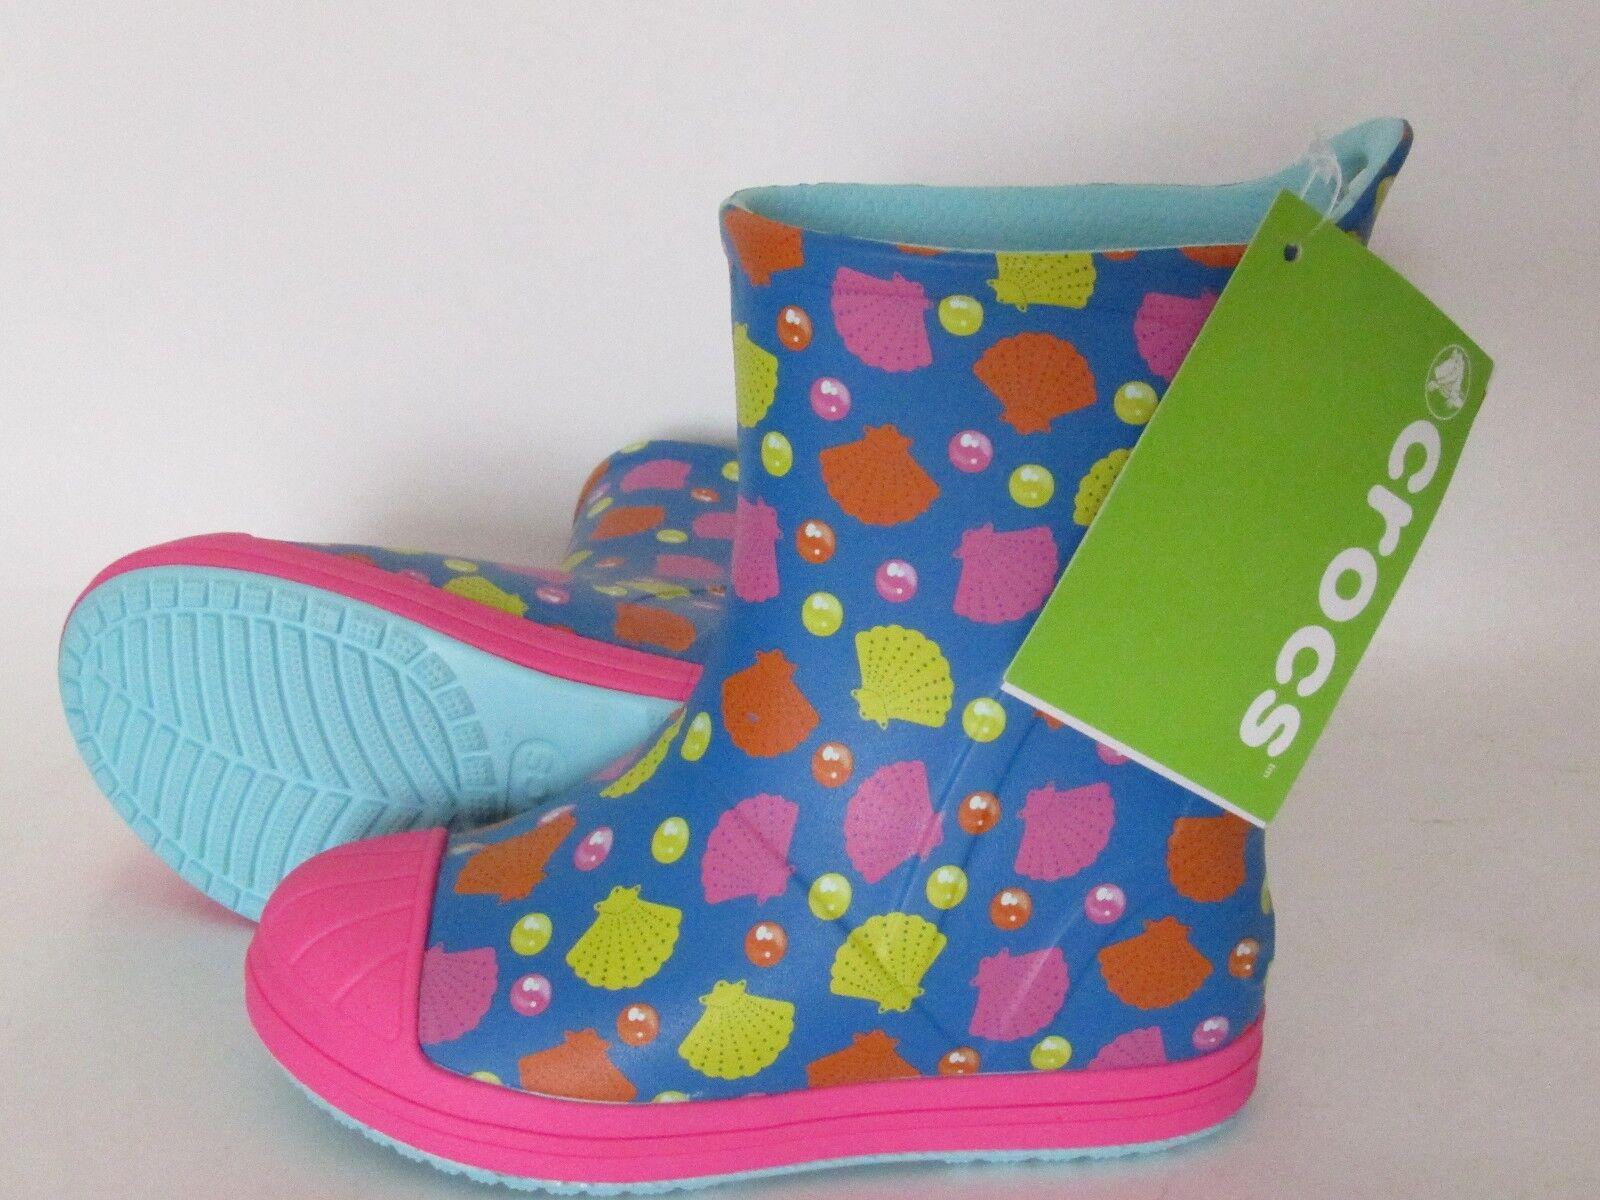 Crocs Bump It Shells Printed Rain Boots Toddler Girls size 6, 8